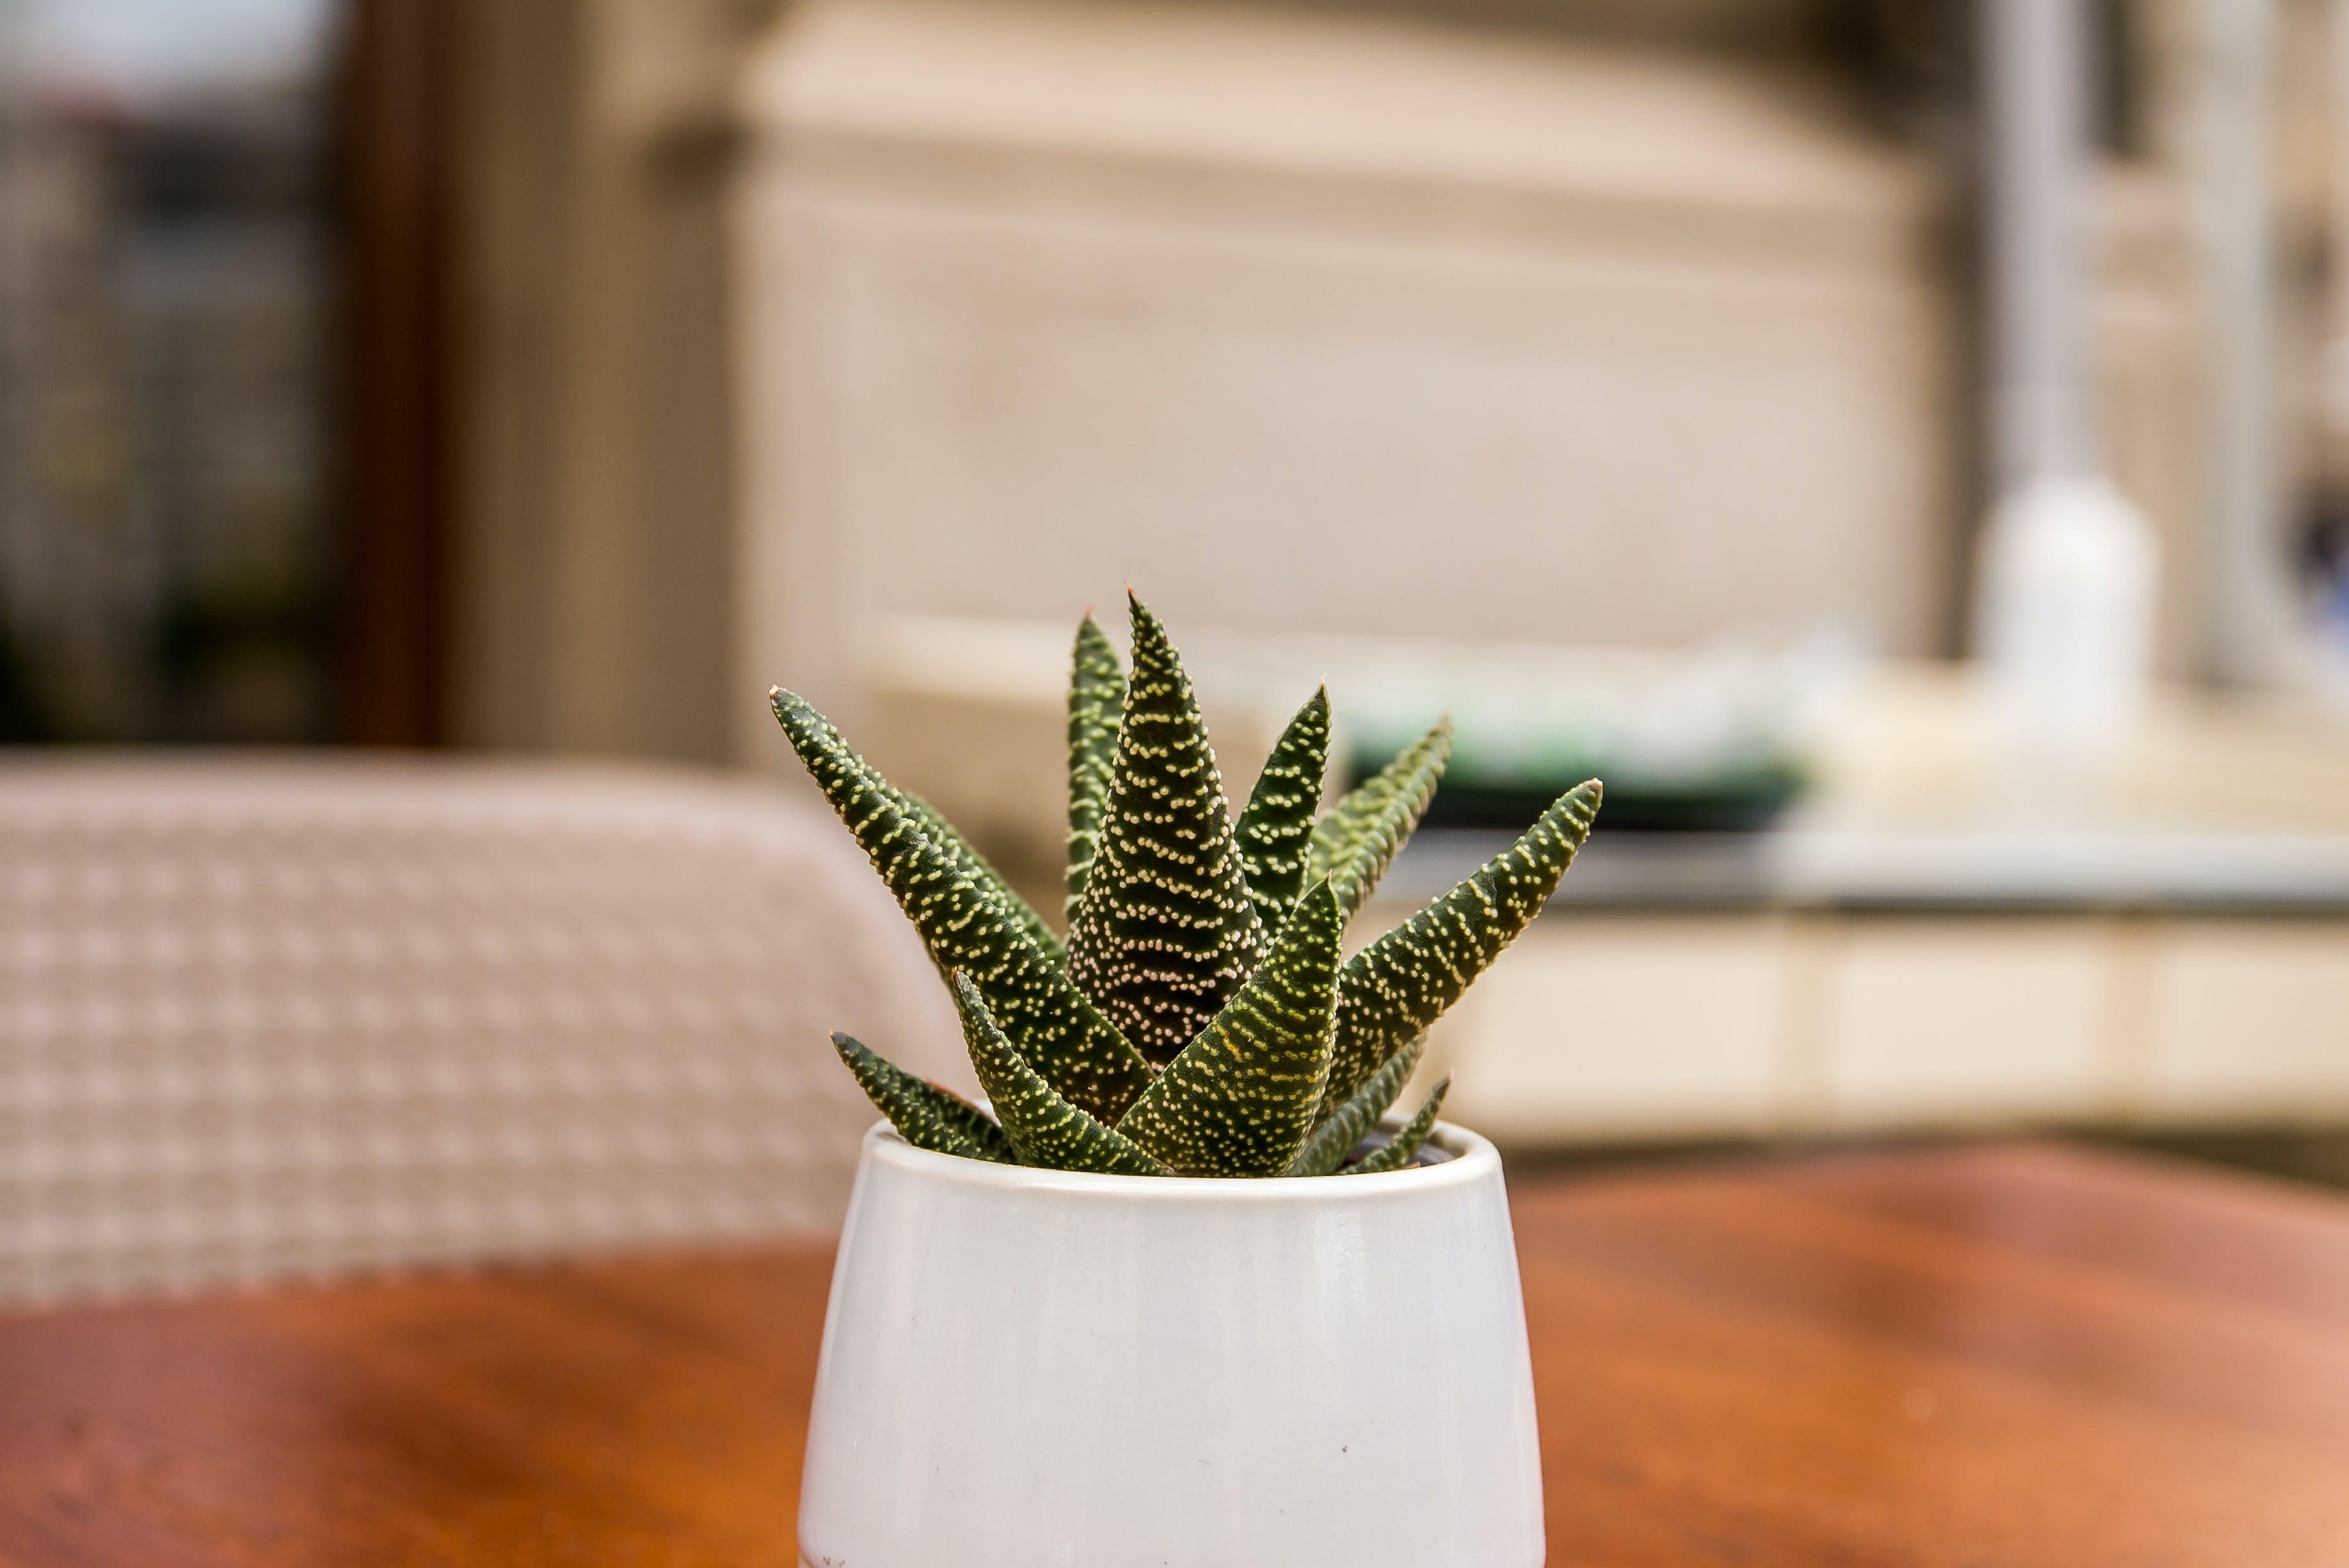 Green Aloe Vera on White Ceramic Vase